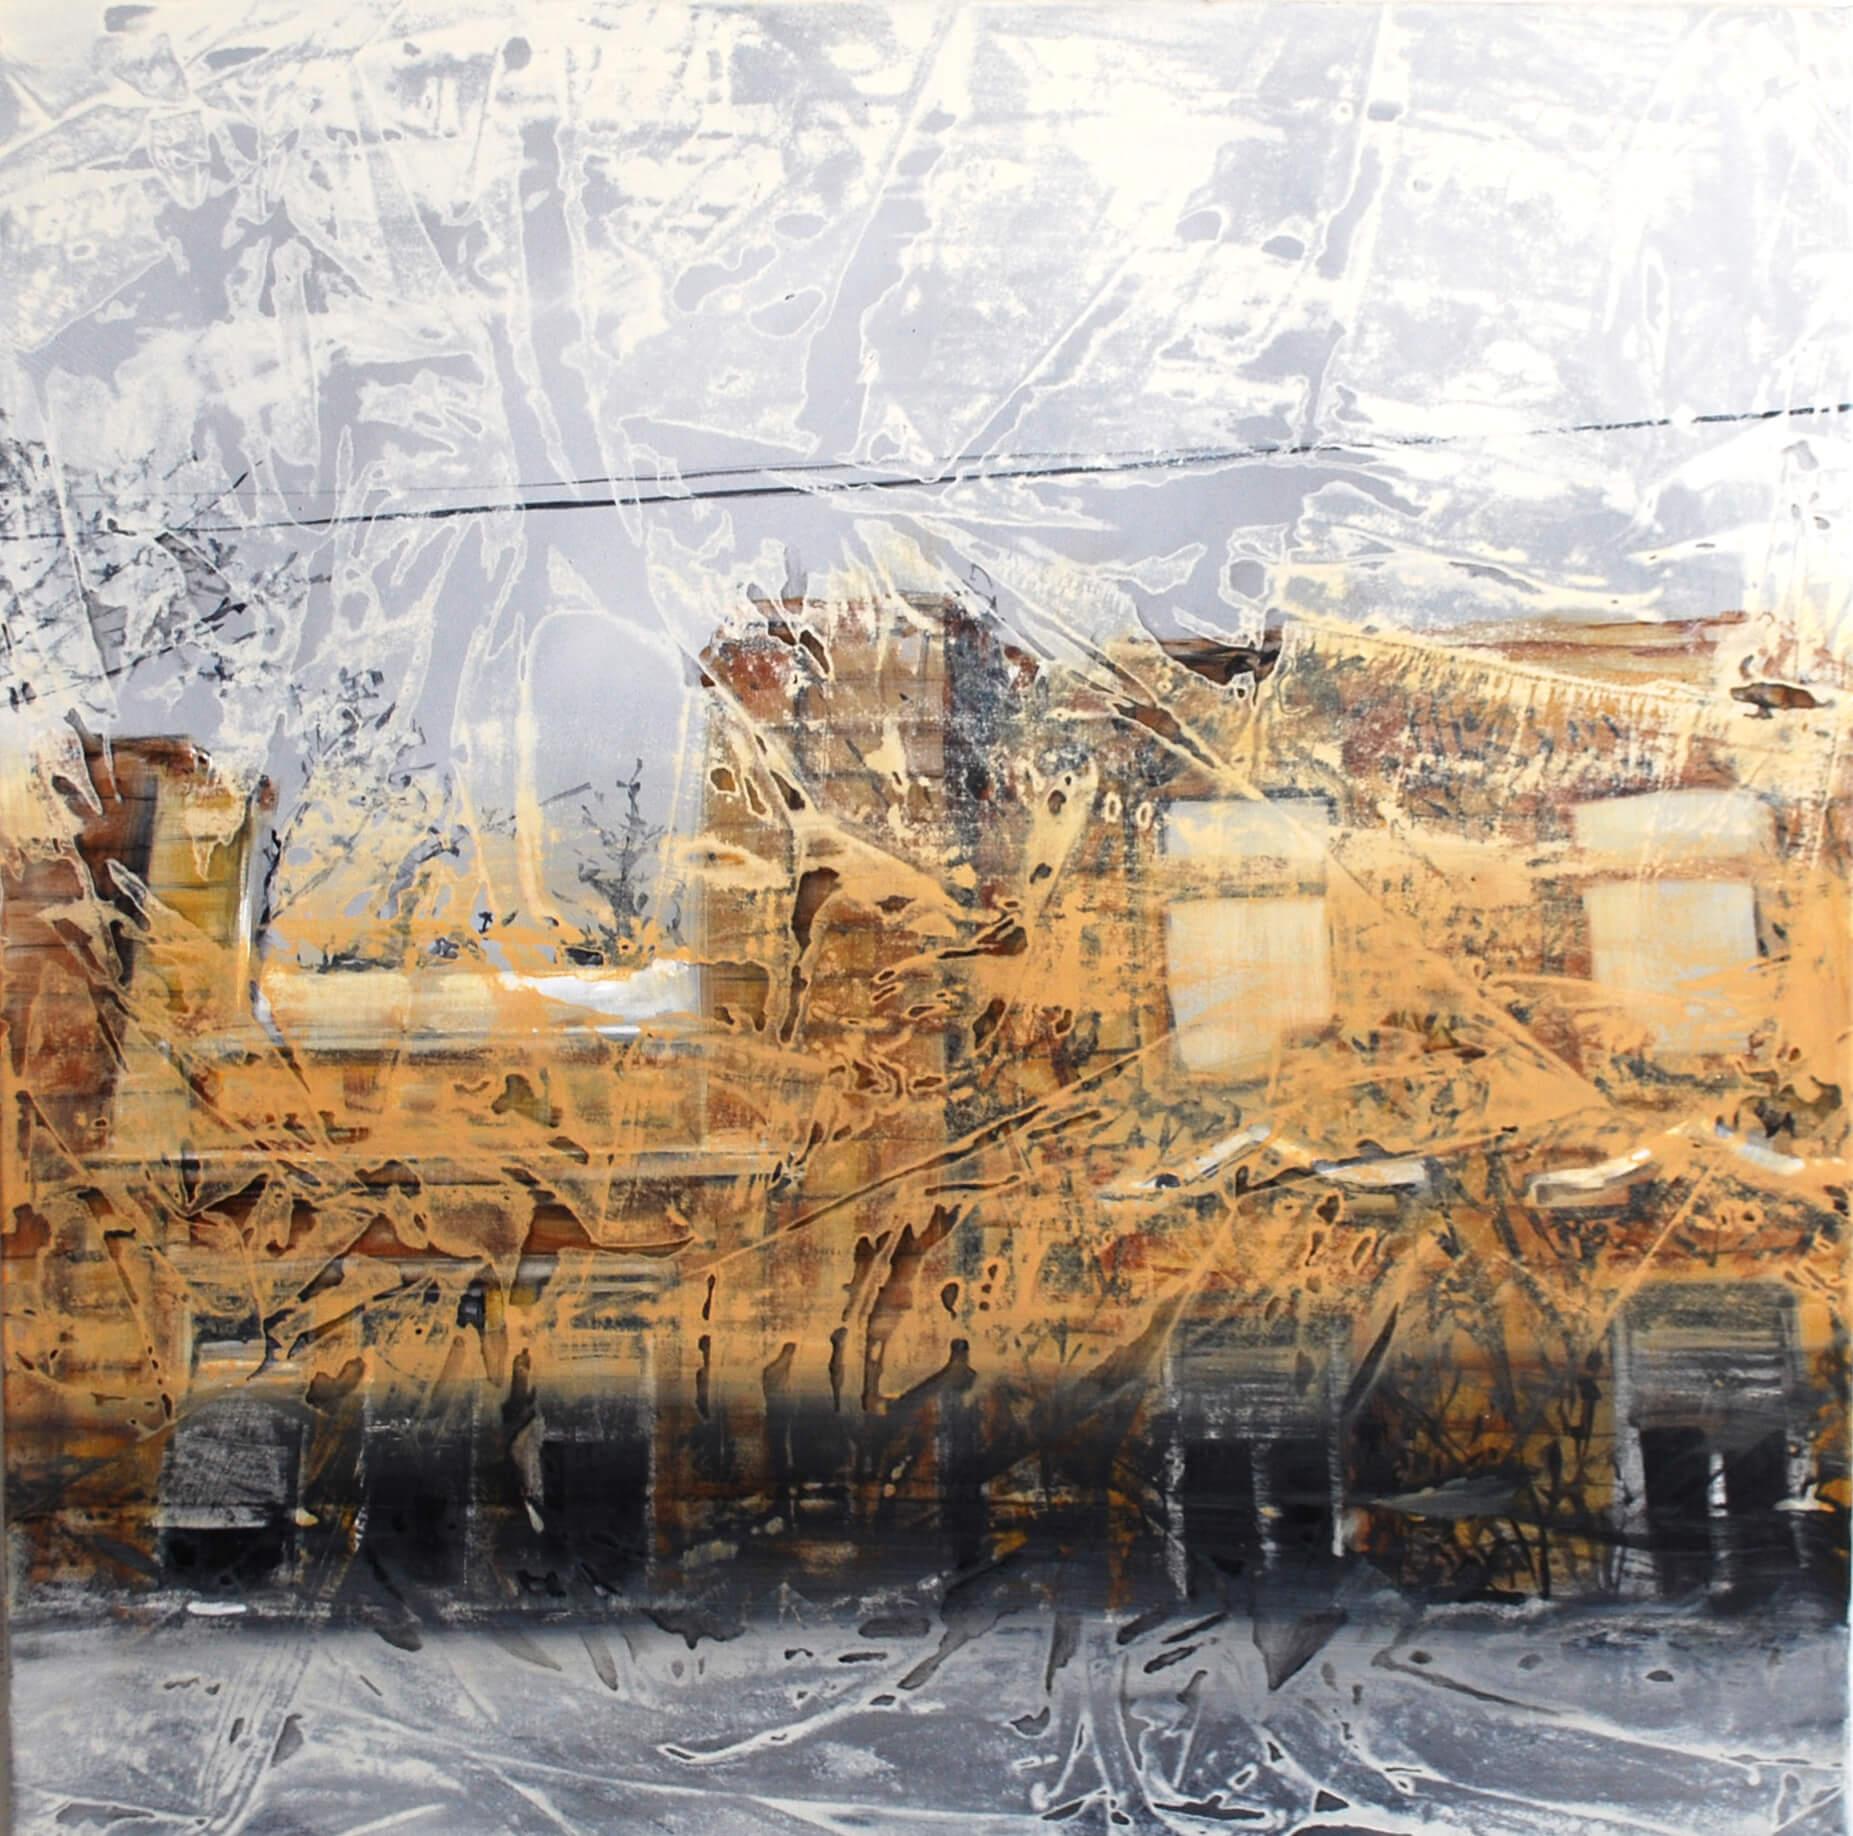 Sklap (Palisády 43) 100 x 100 cm akryl na plátne 2016